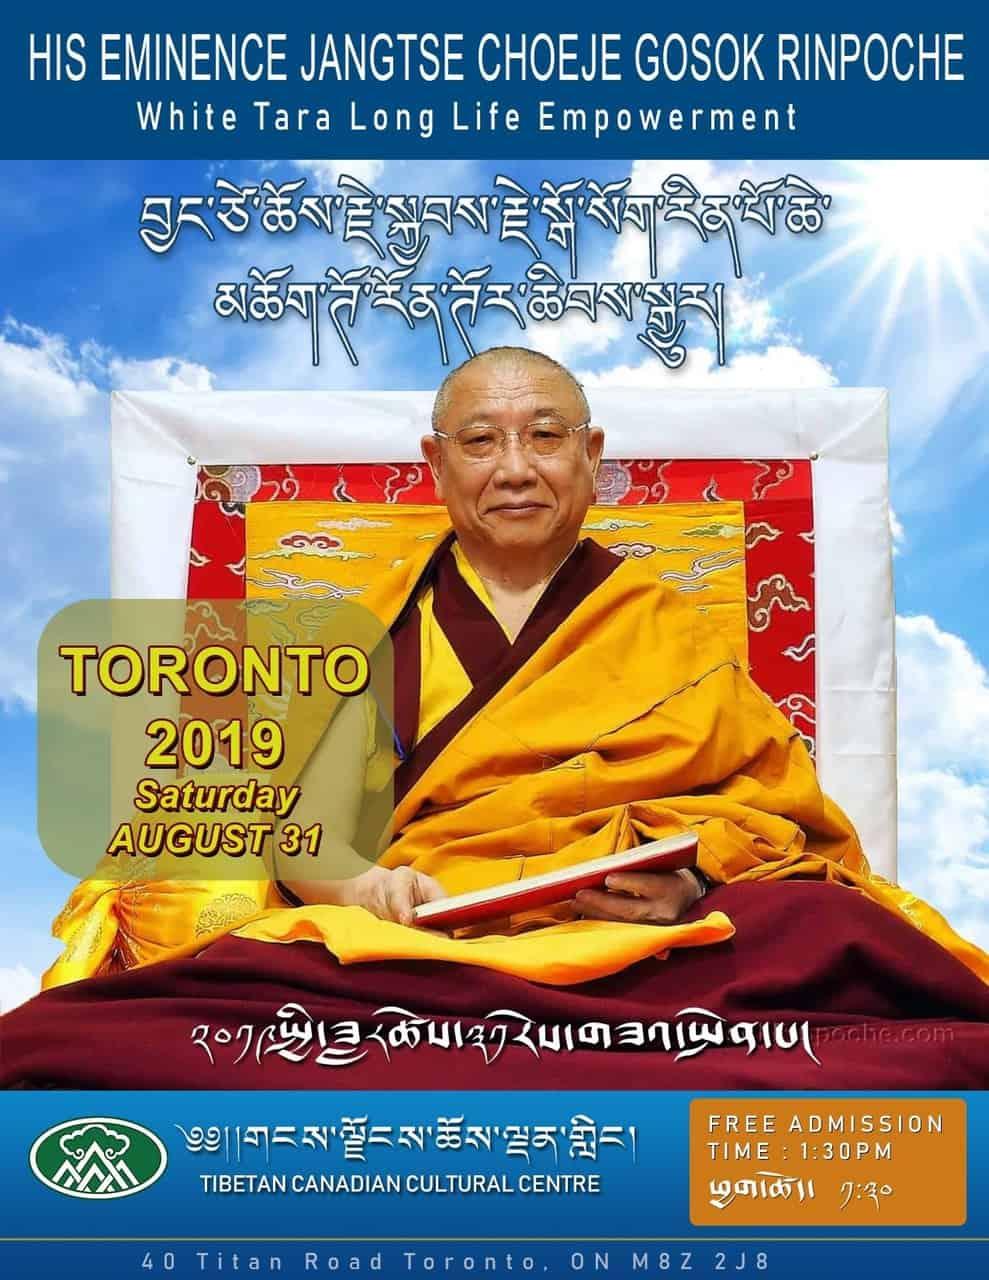 Kyabje Jangtse Choje Gosok Rinpoche 蔣哲曲傑果碩仁波切果硕仁